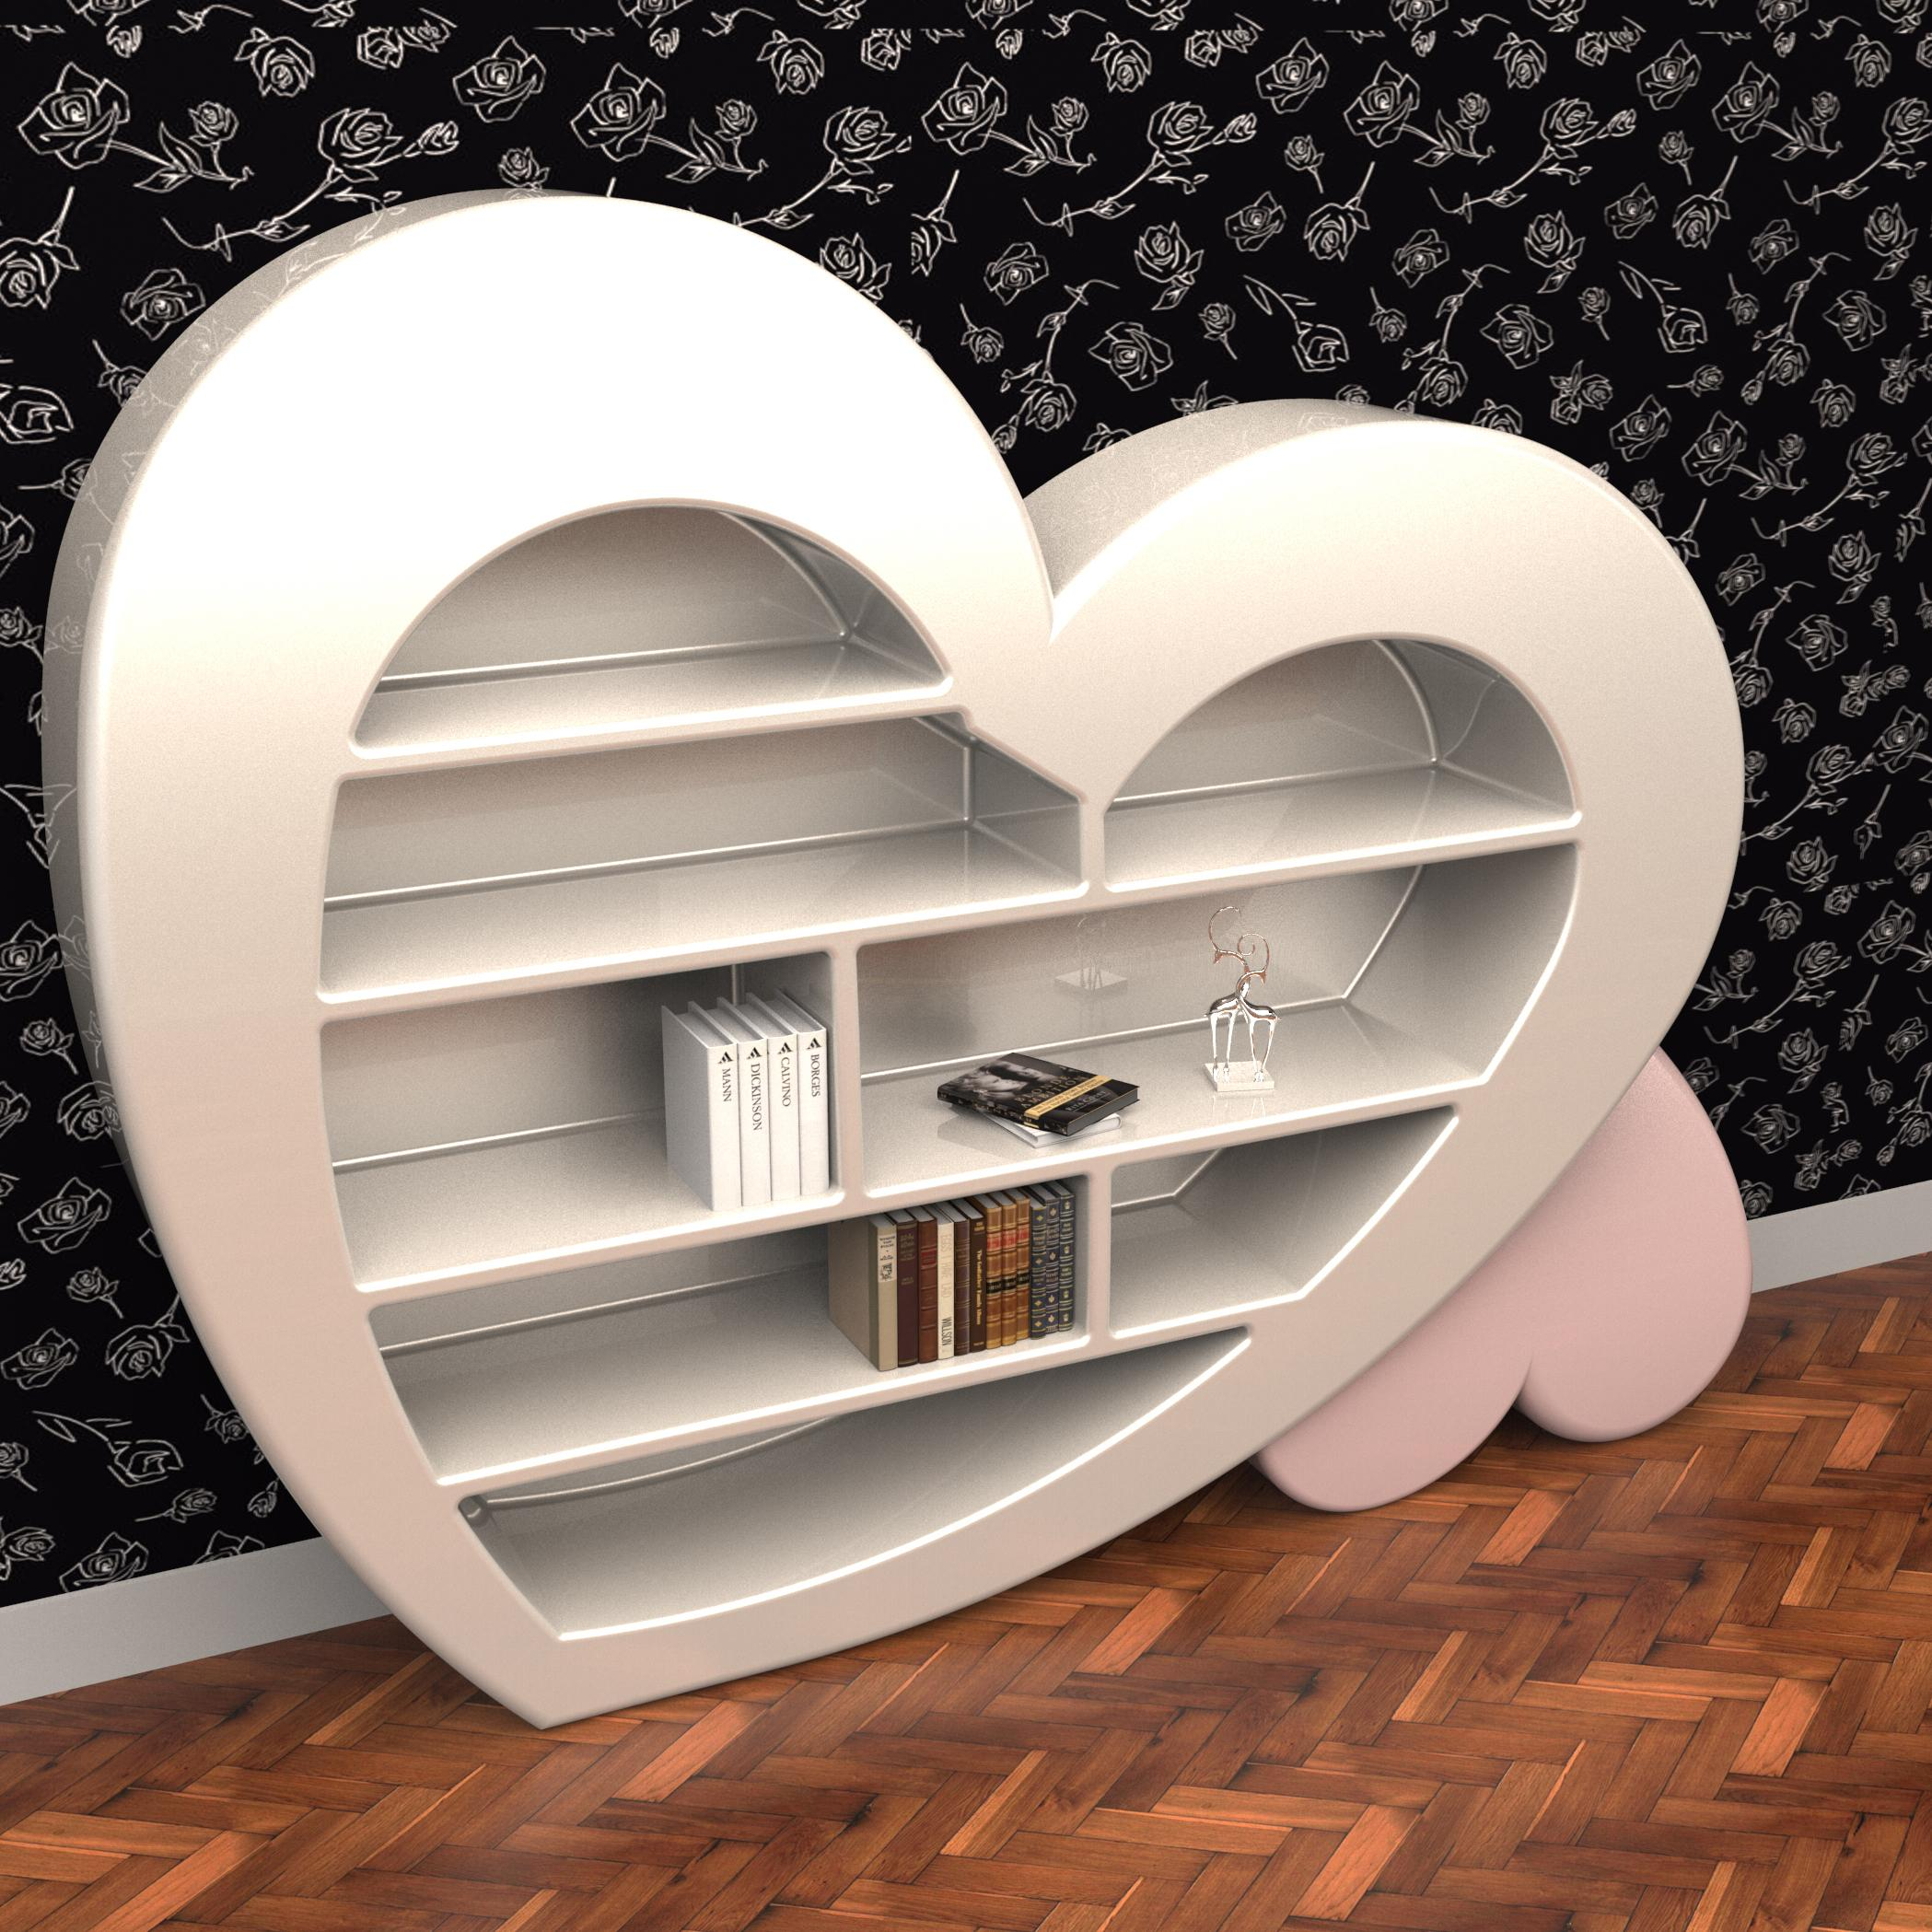 Cuore libreria italy dream design for Librerie mobili offerte